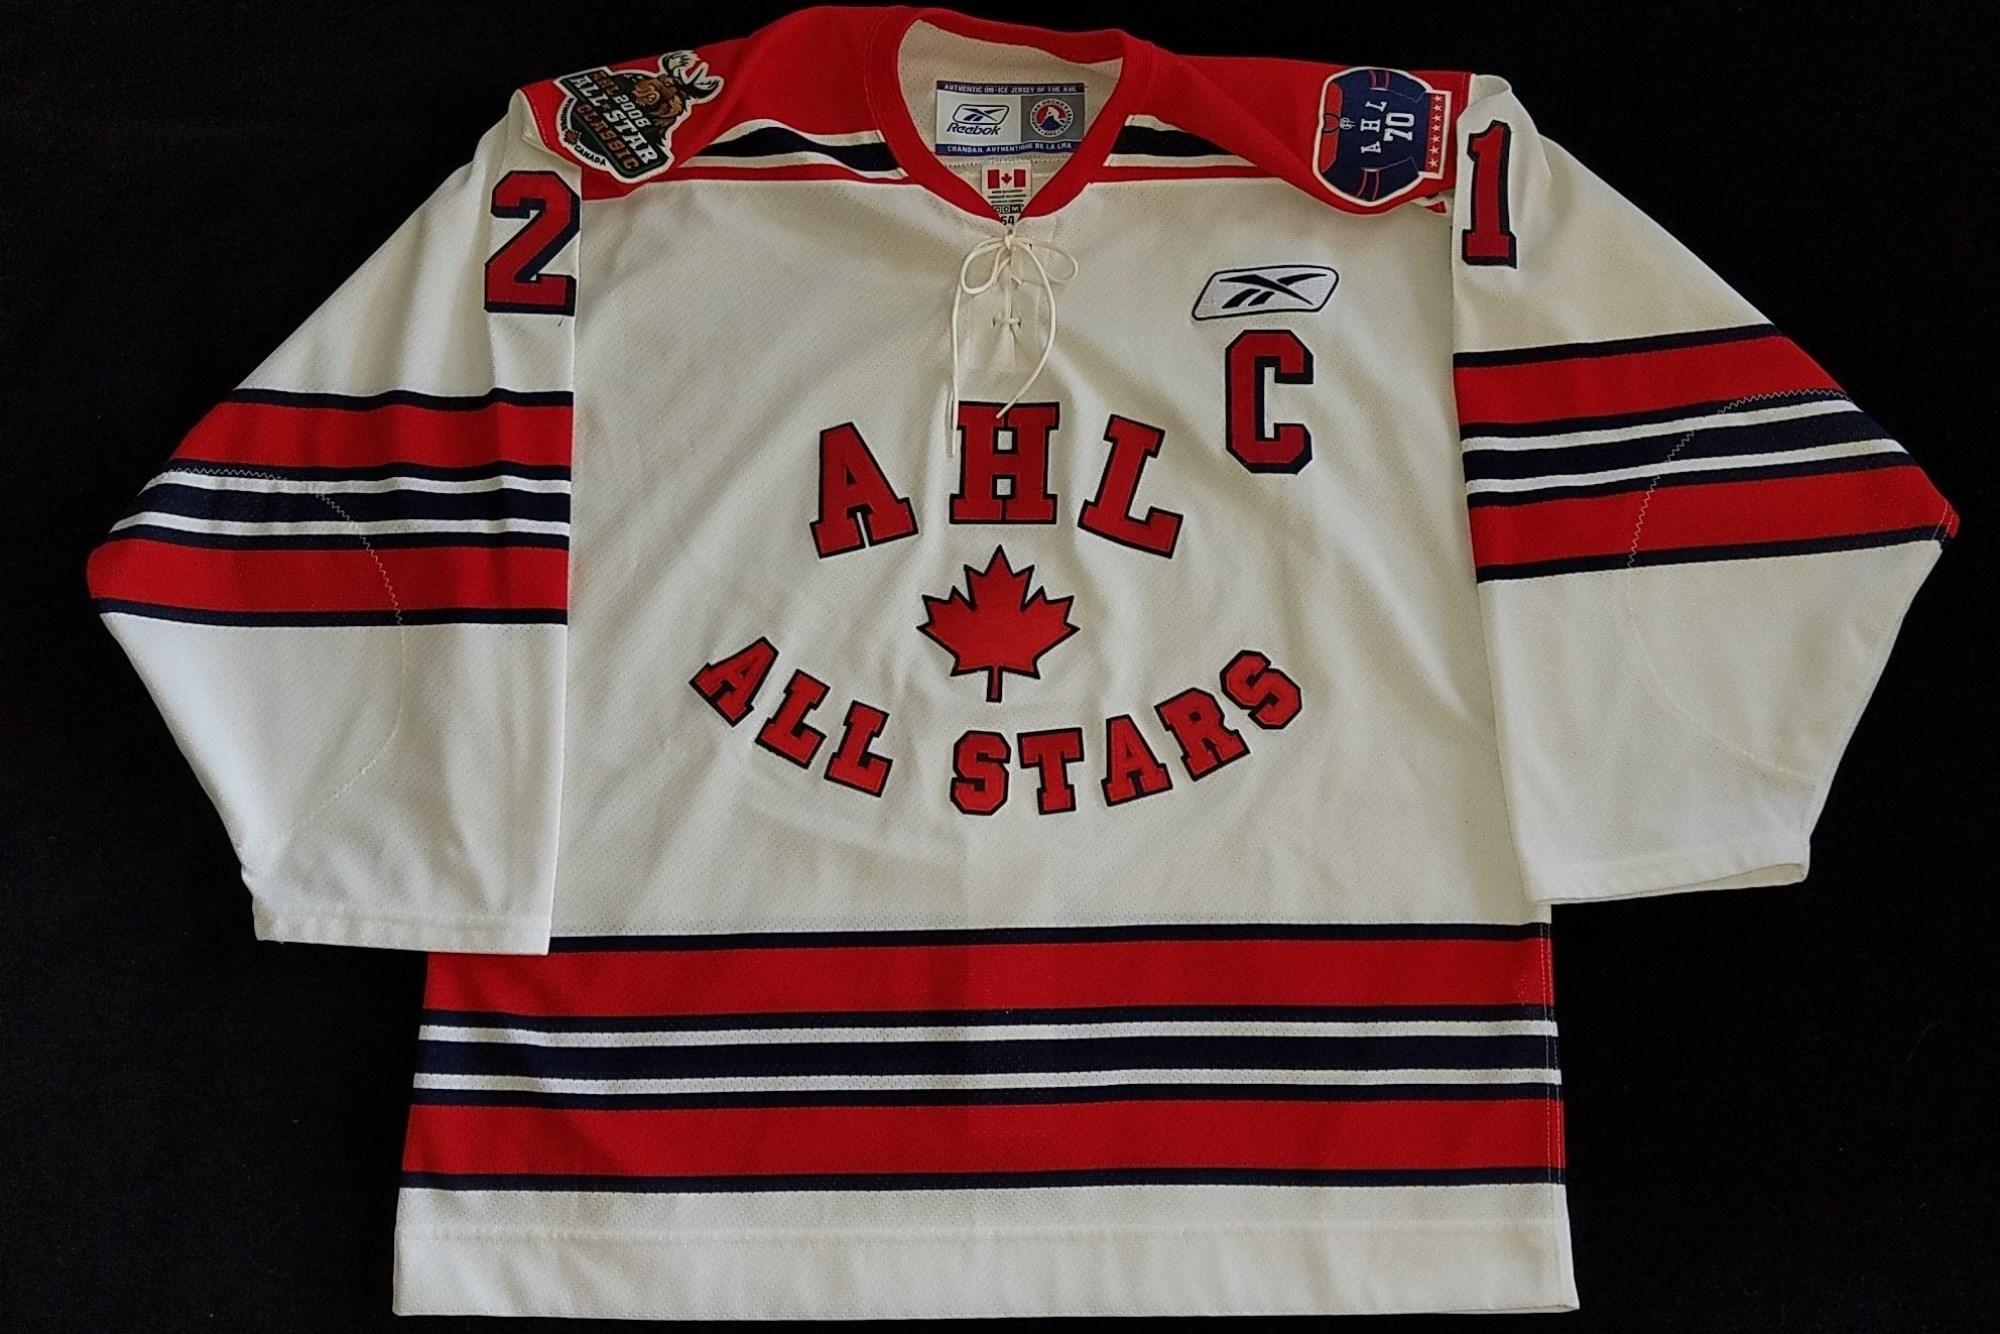 53990c50cbd AHL Game Worns at Johnson's Jerseys